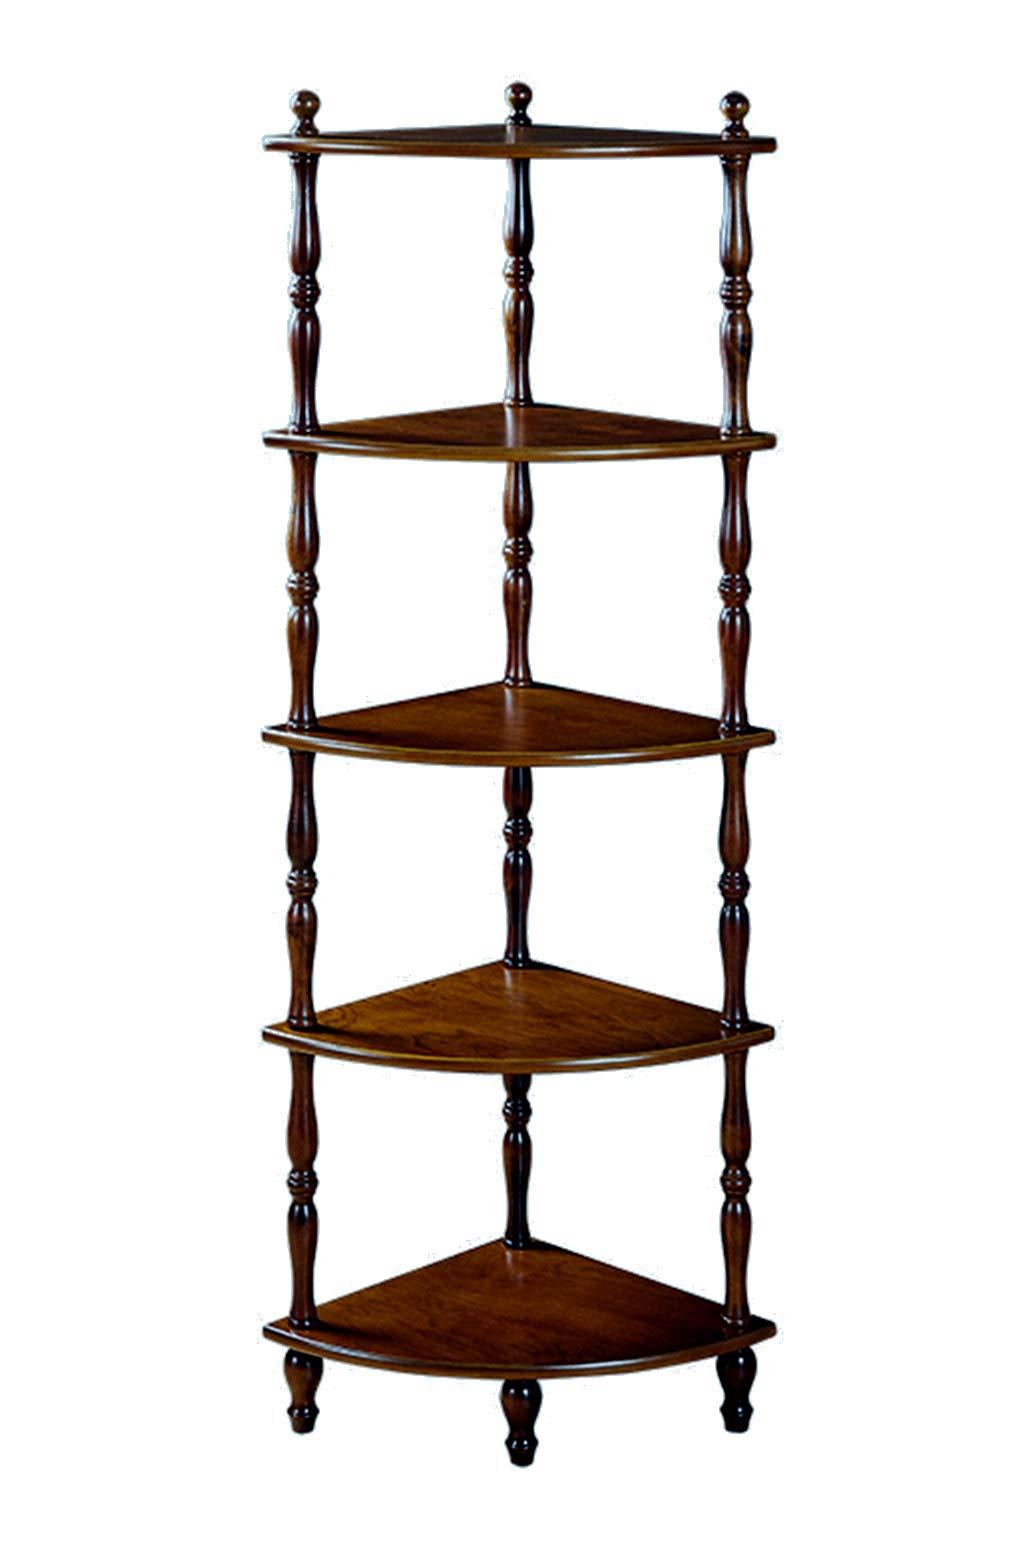 HAFurniture Classic 5 Tier Bookcase Shelf, Elegant Stand Wooden Rustic Corner Shelves Rack with 4 Leg Supports (Black Walnut)